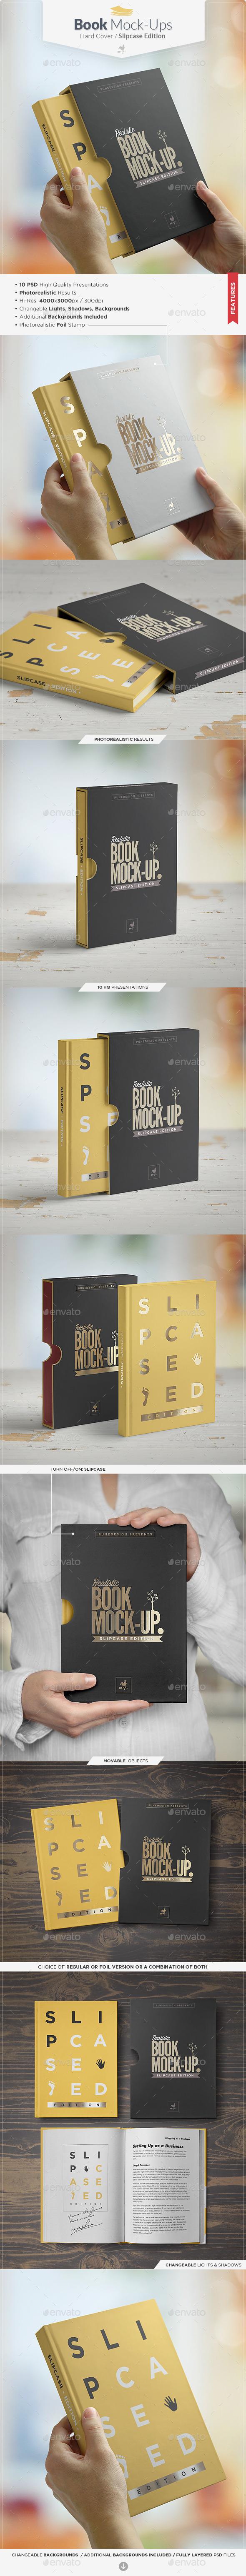 Book Mock-up / Slipcase Edition - Books Print